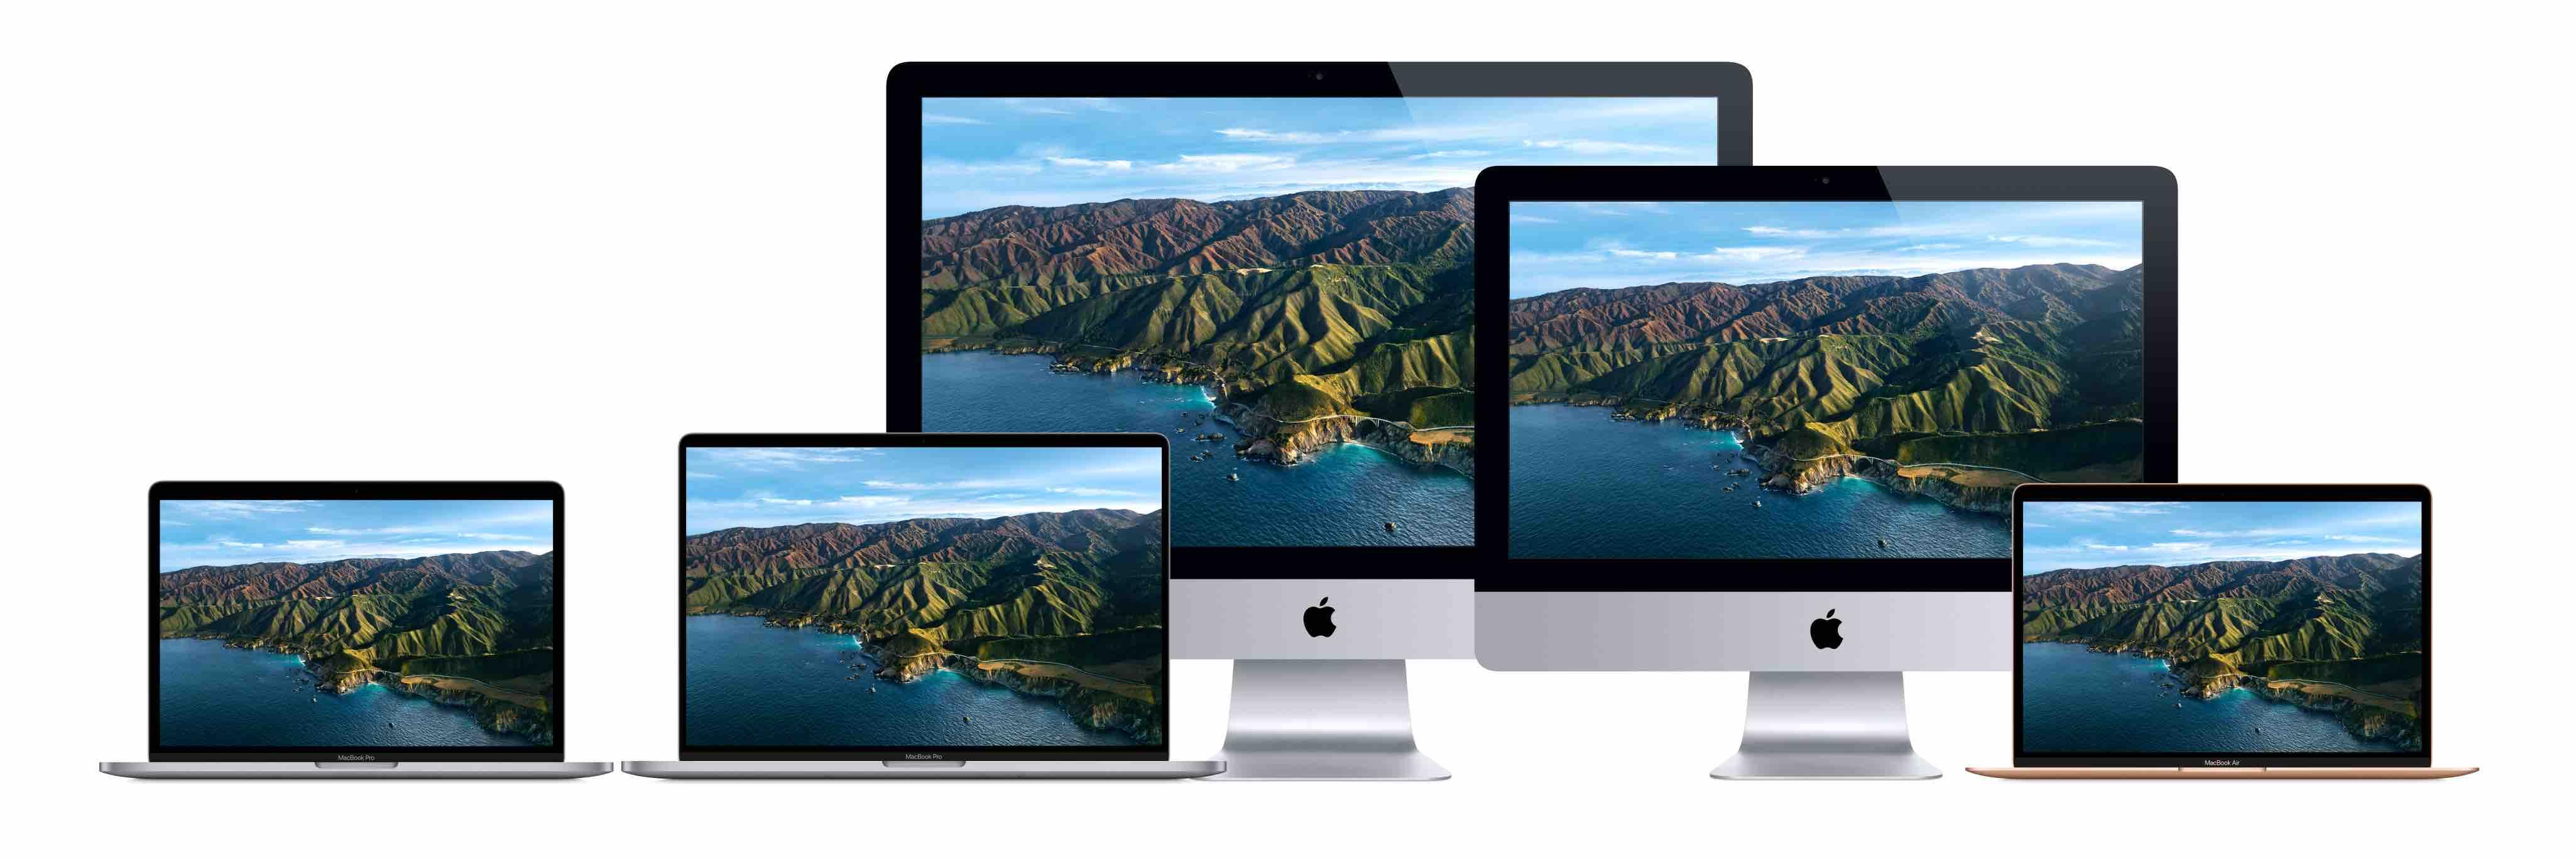 Mac product family image